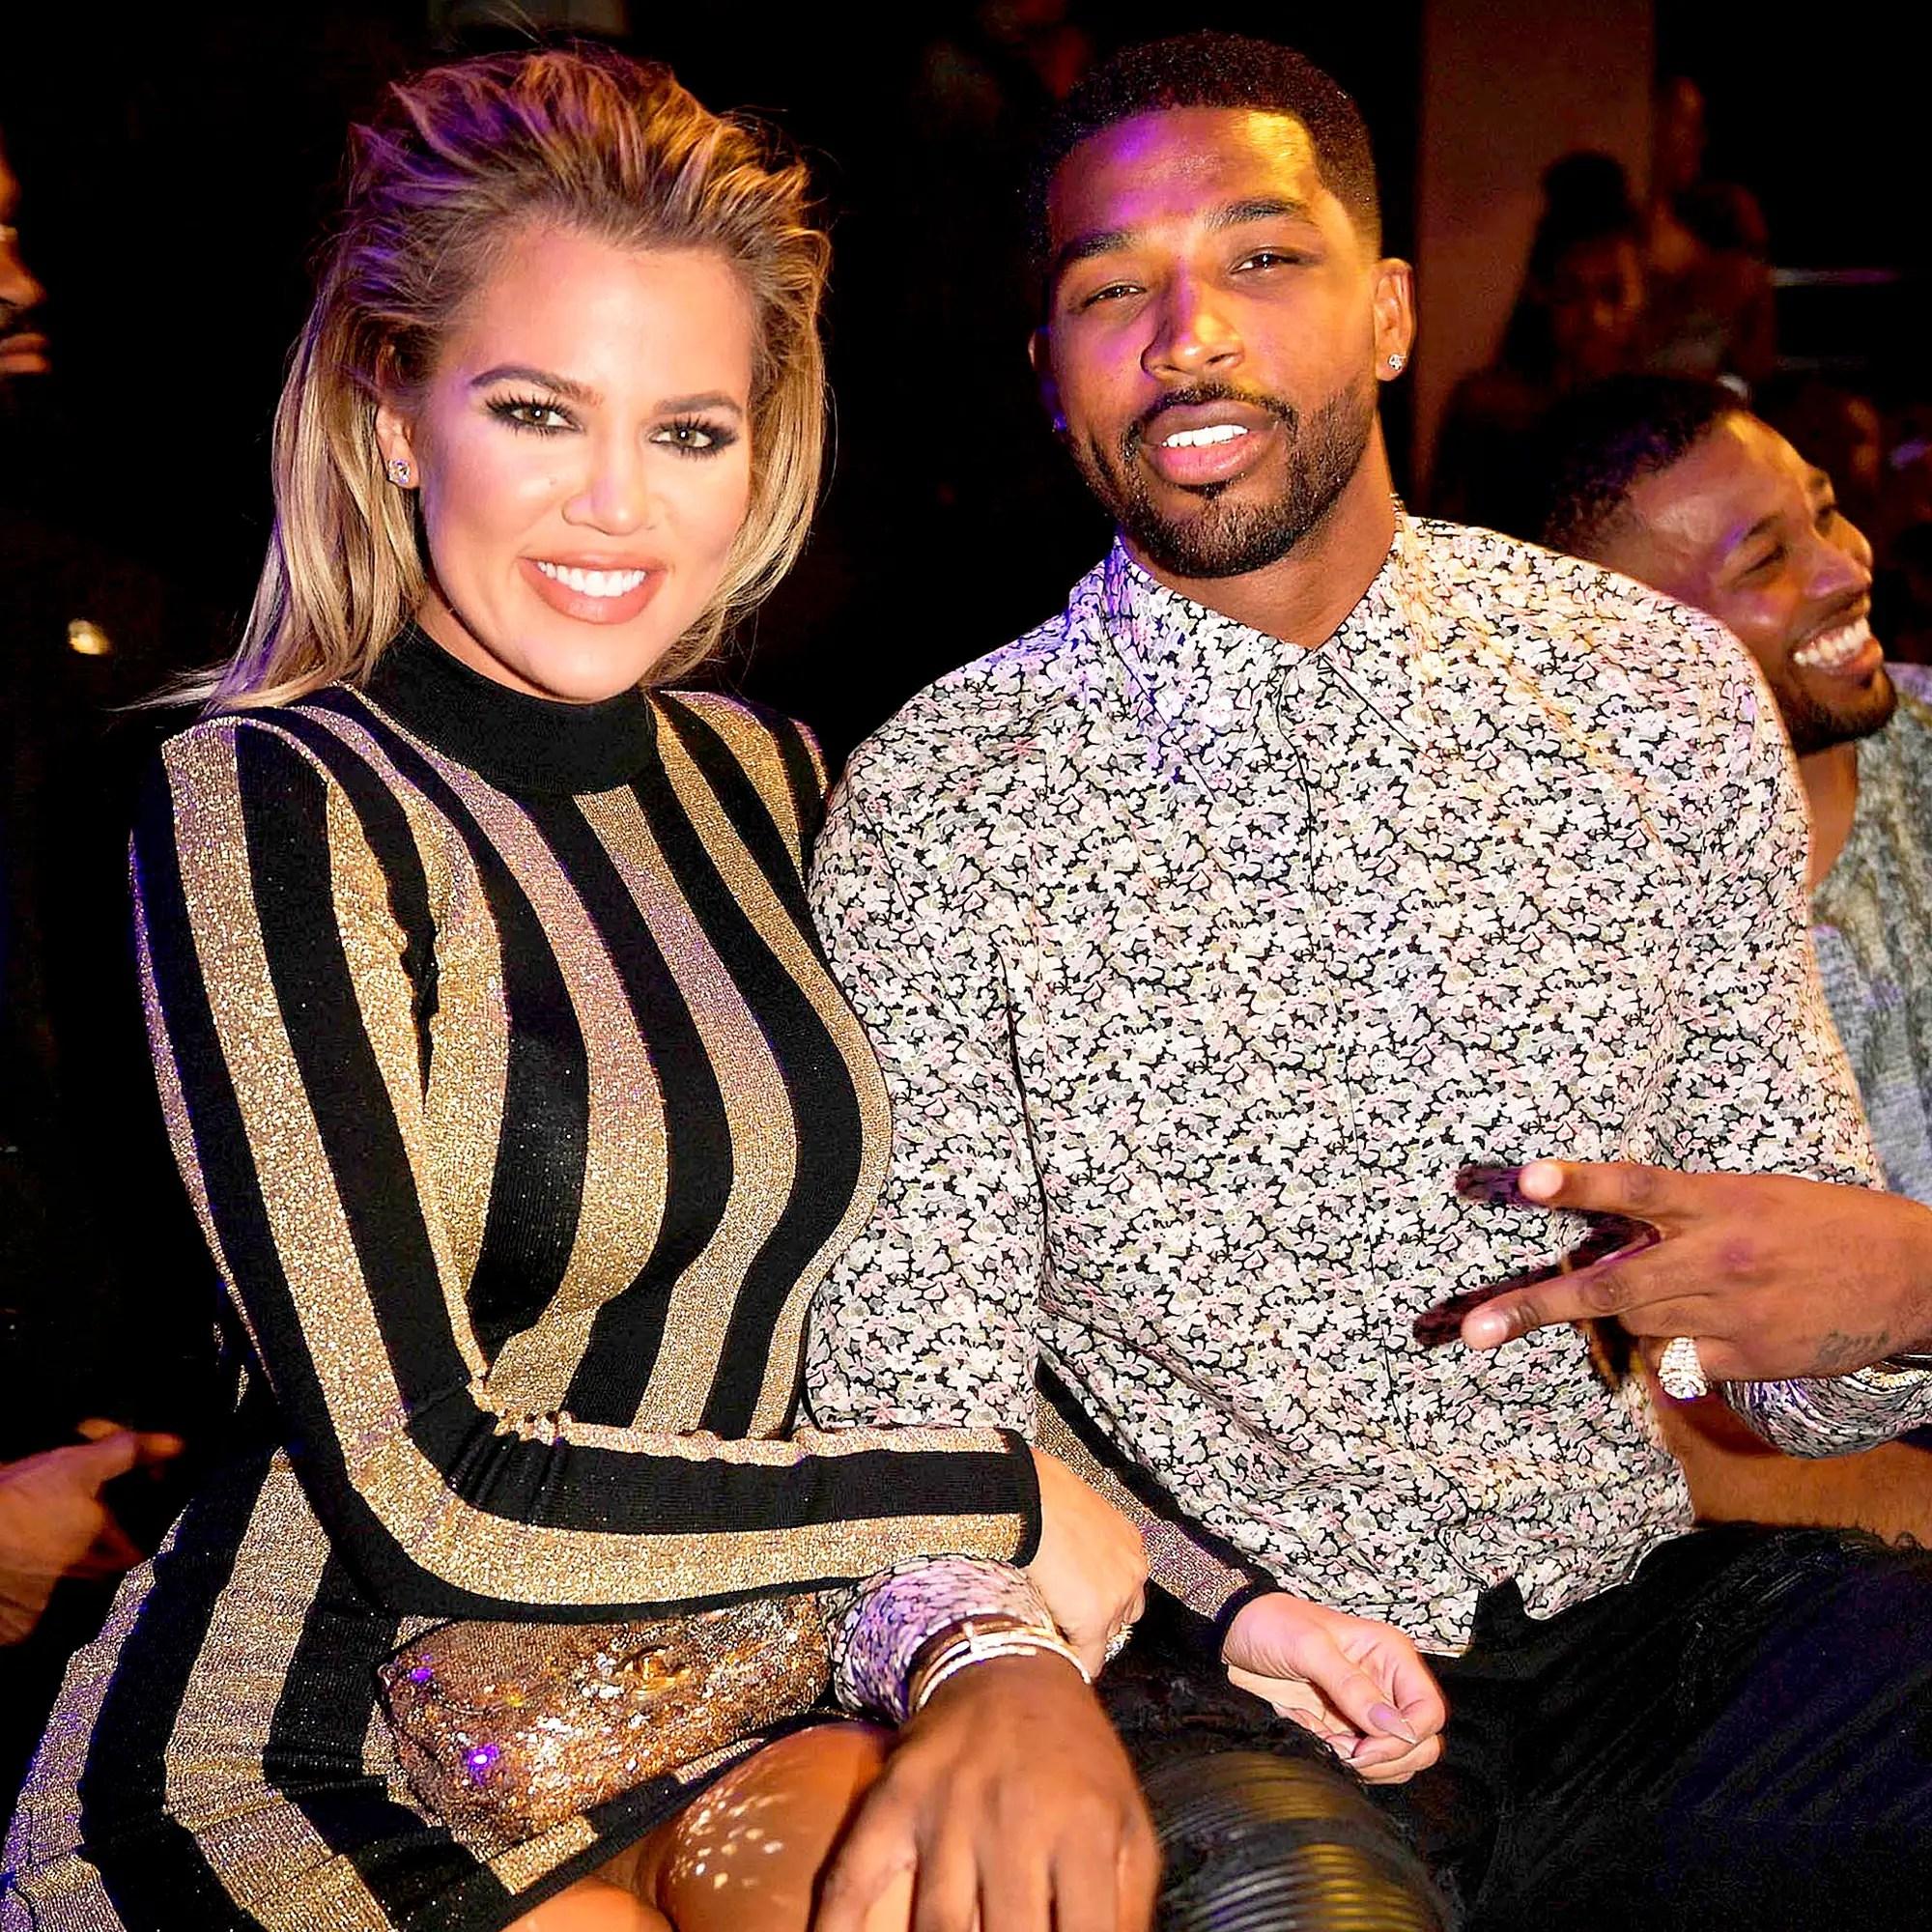 Khloe kardashian dating basketball